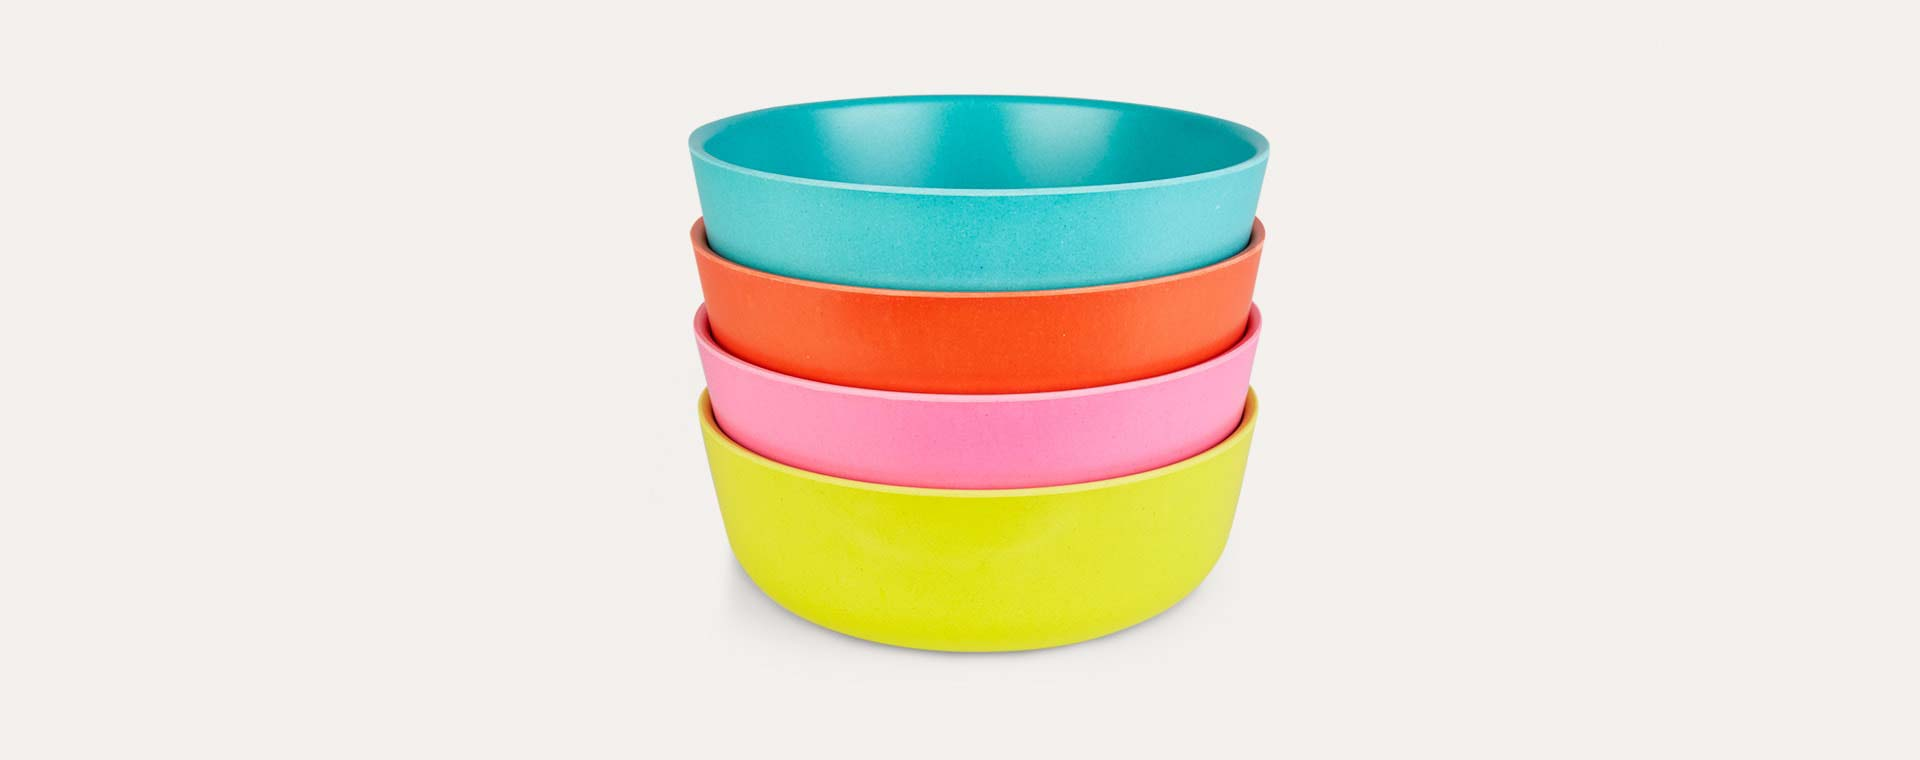 Brights EKOBO Bowl Set - 4 Pack